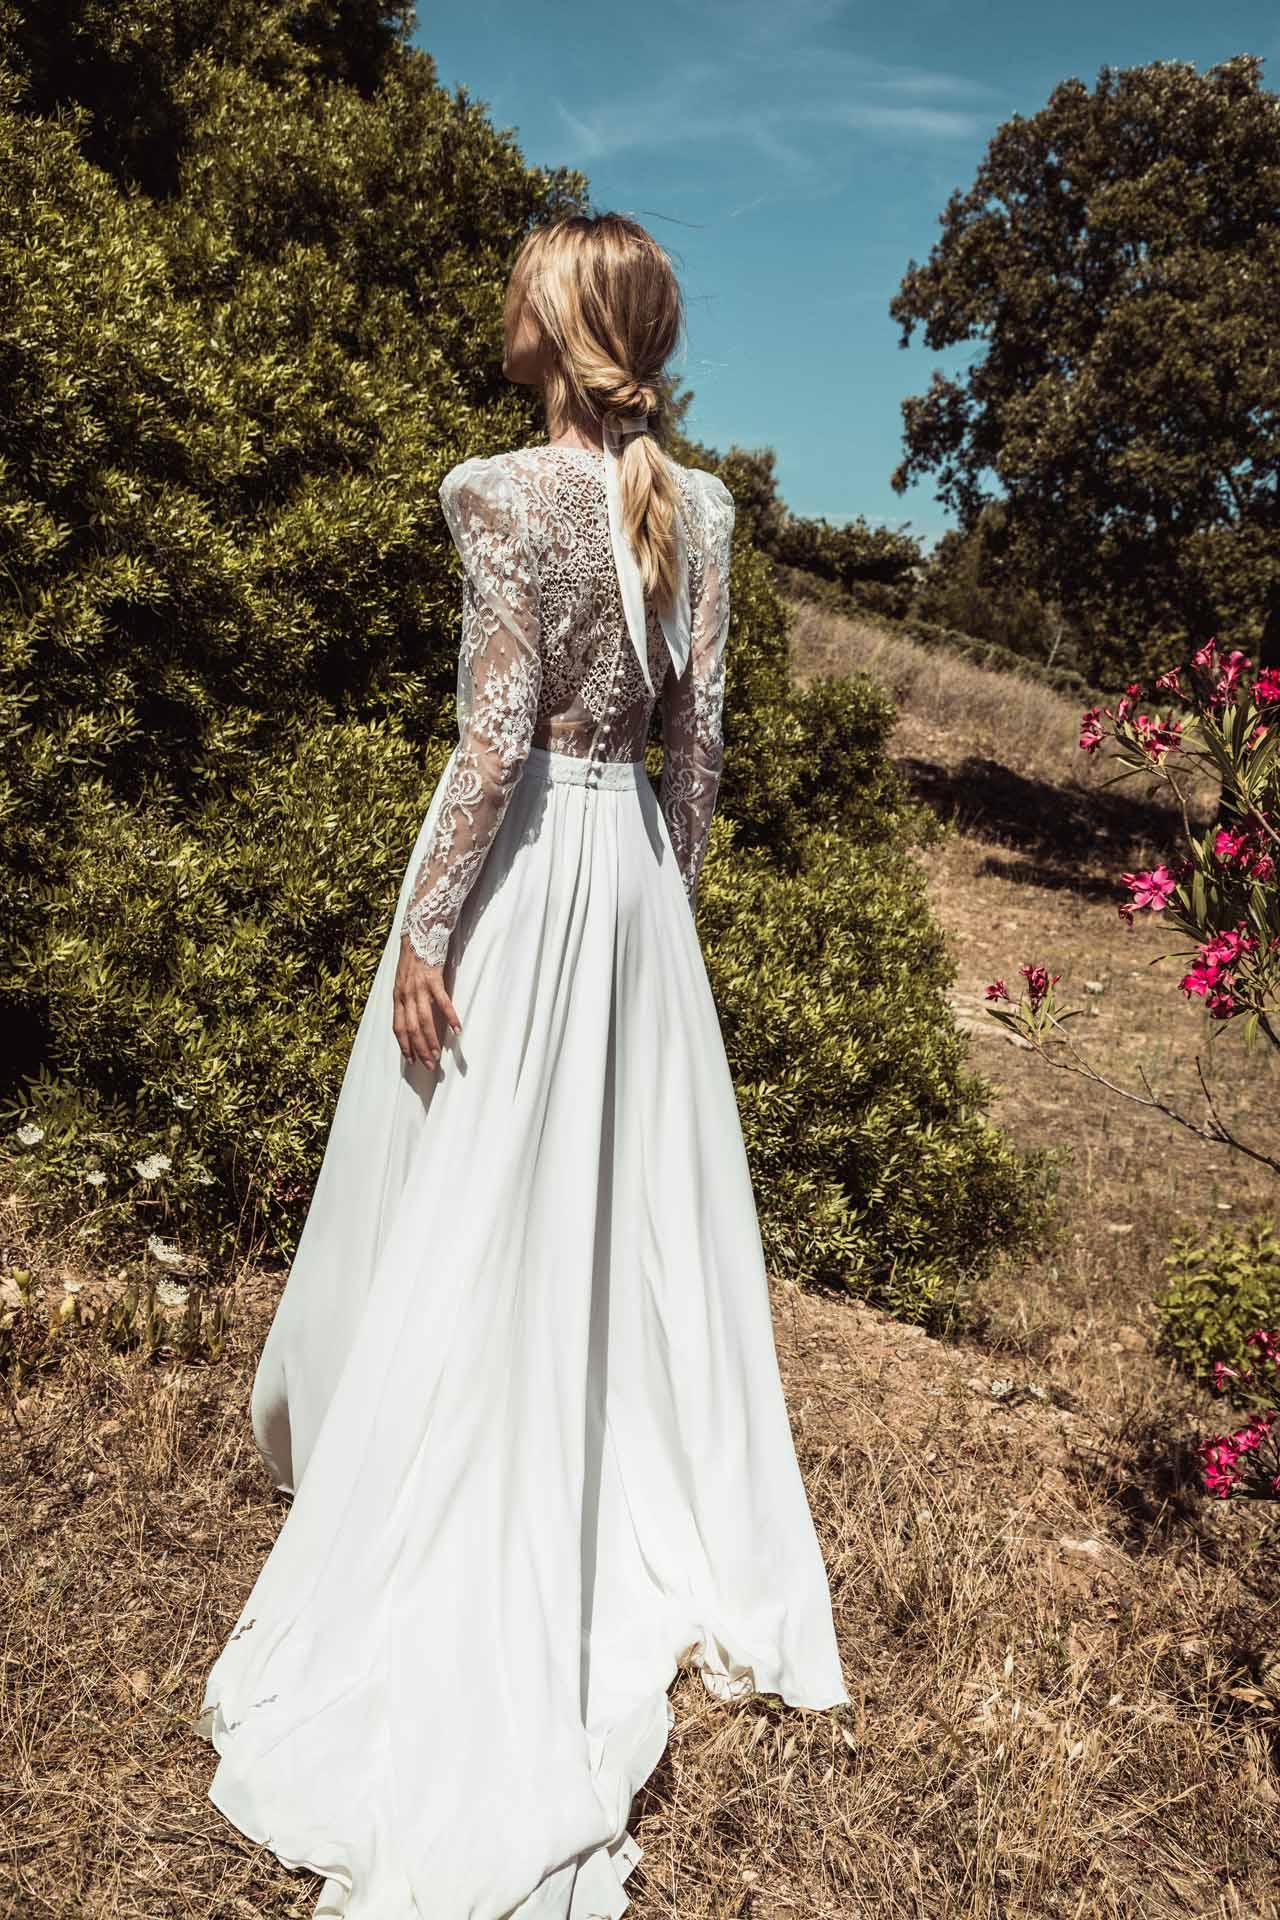 magasin robe de mariee paris creatrice robe de mariee en dentelle